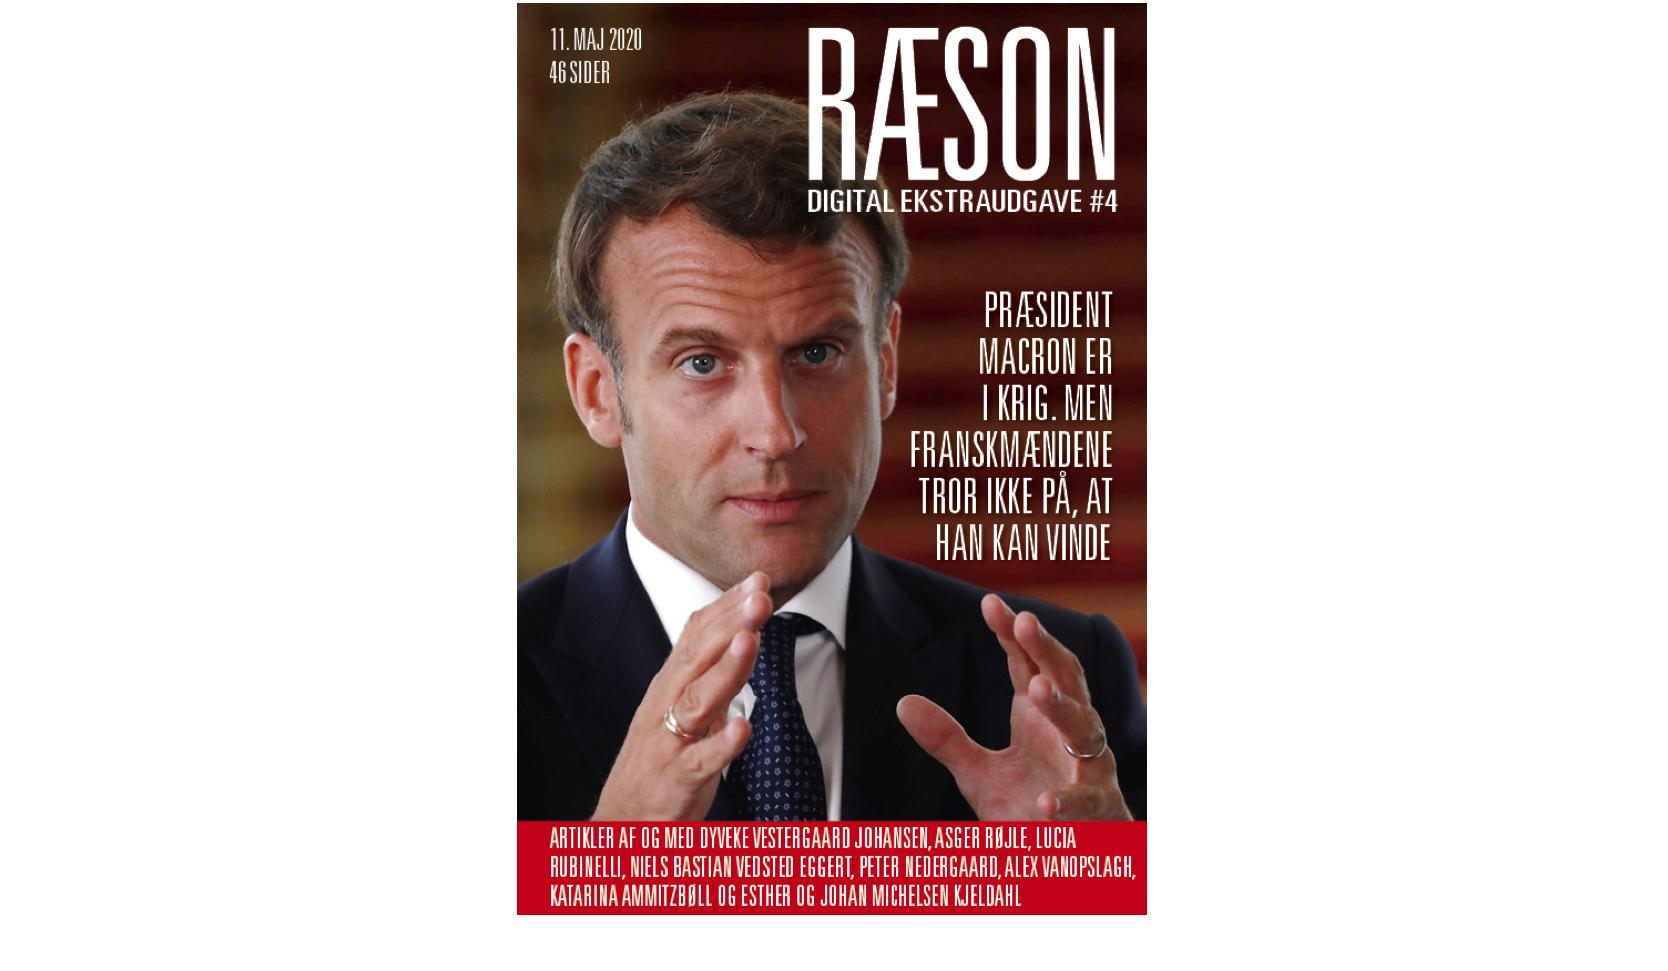 RÆSONEKSTRA#4 (11/5 2020)